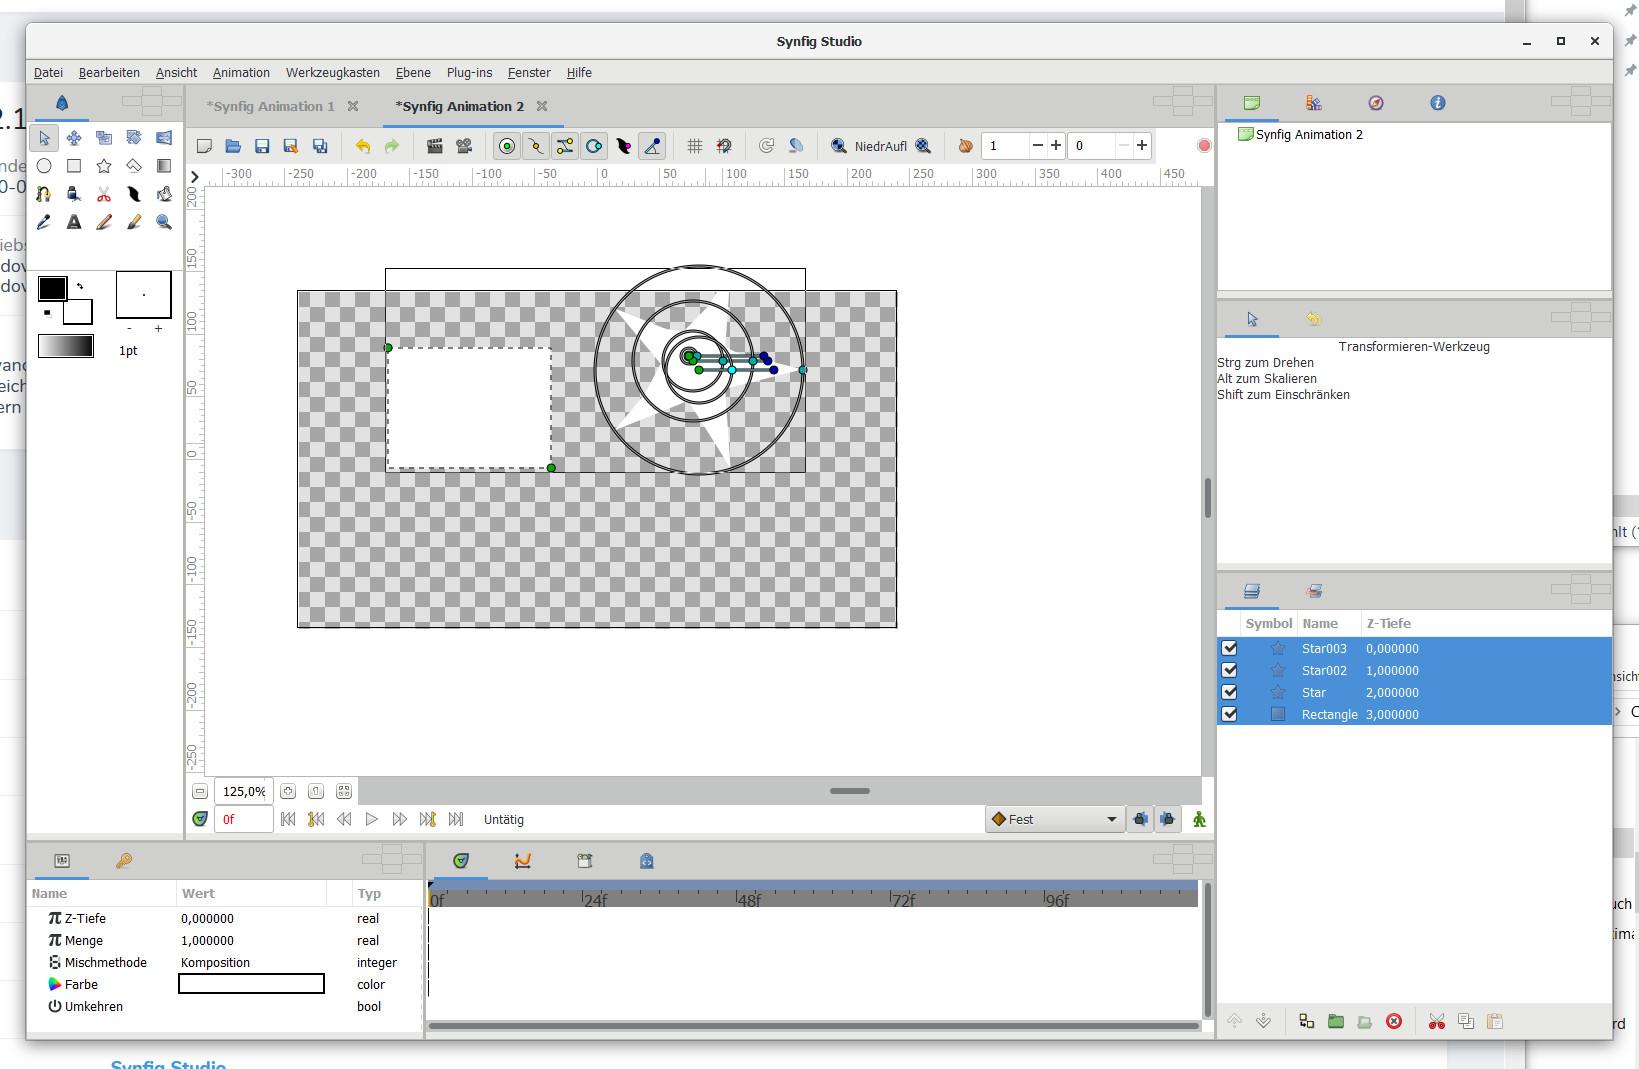 Screenshot 1 - Synfig Studio